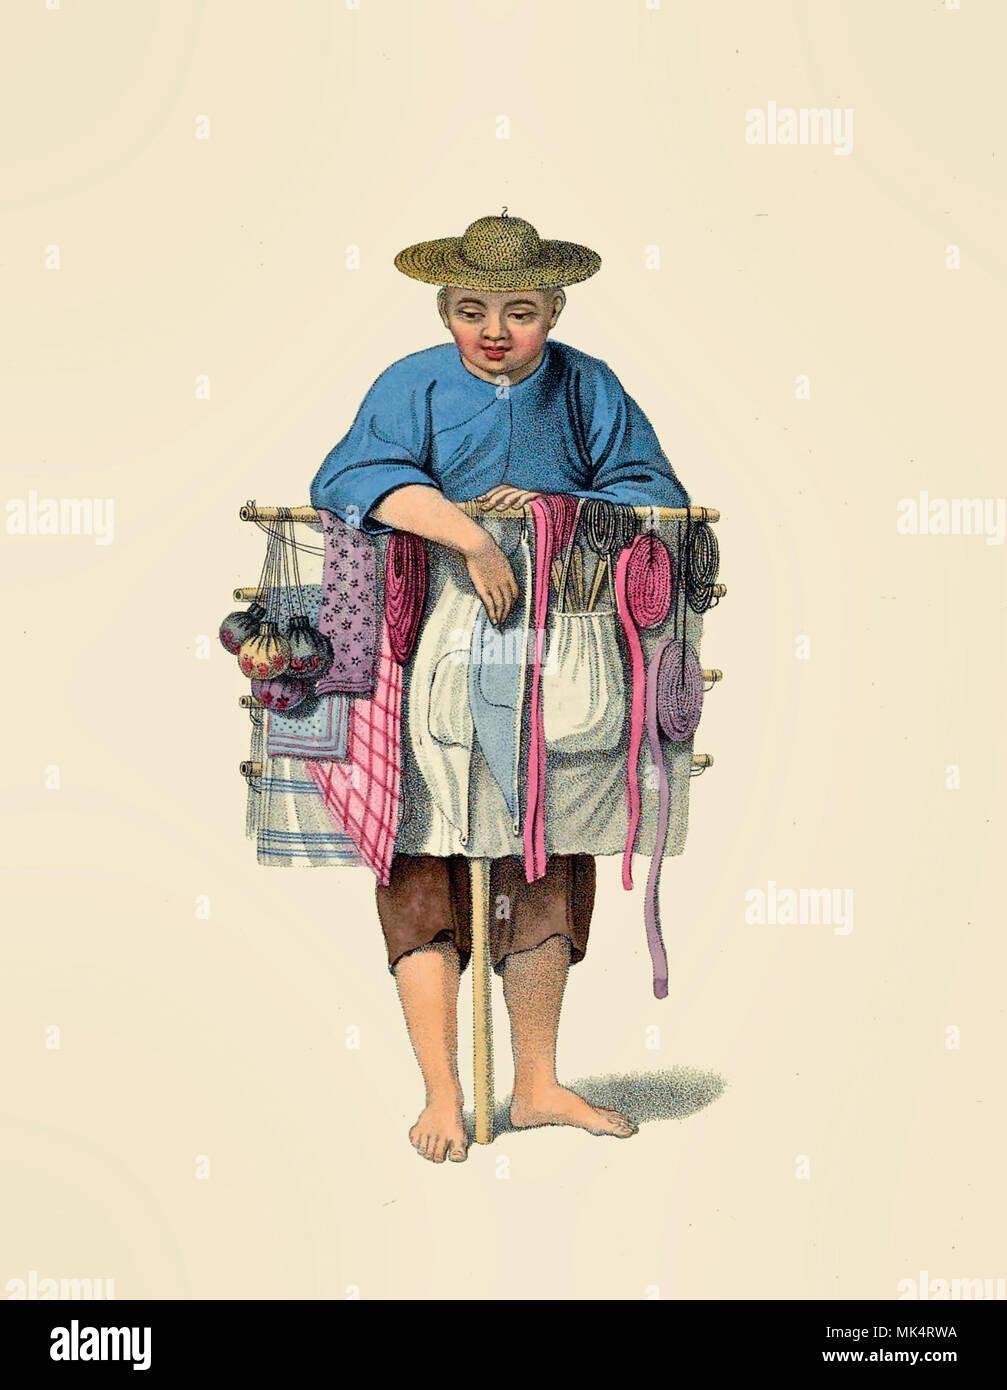 A Peddler in China, circa 1800 - Stock Image